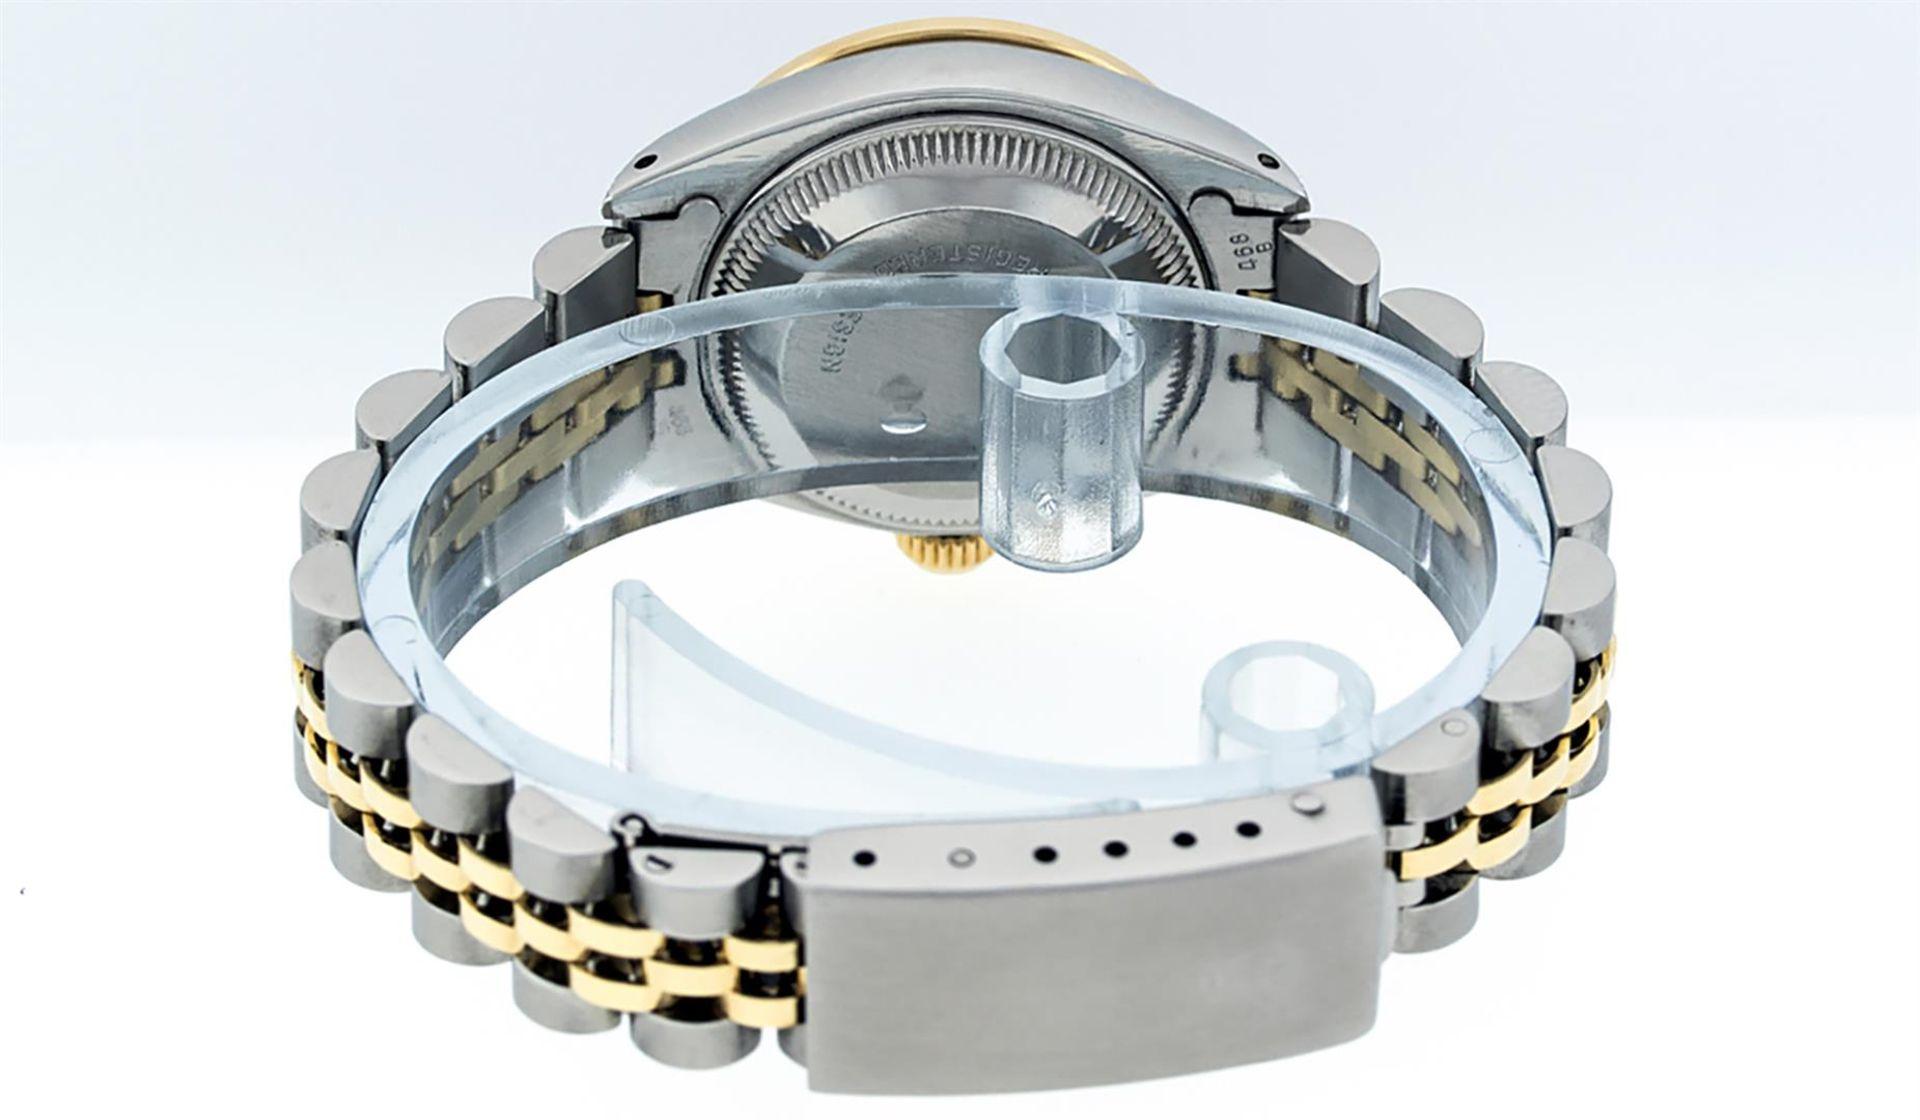 Rolex Ladies 2 Tone Black Lugs & Pyramid Diamond Datejust Wriswatch - Image 6 of 7